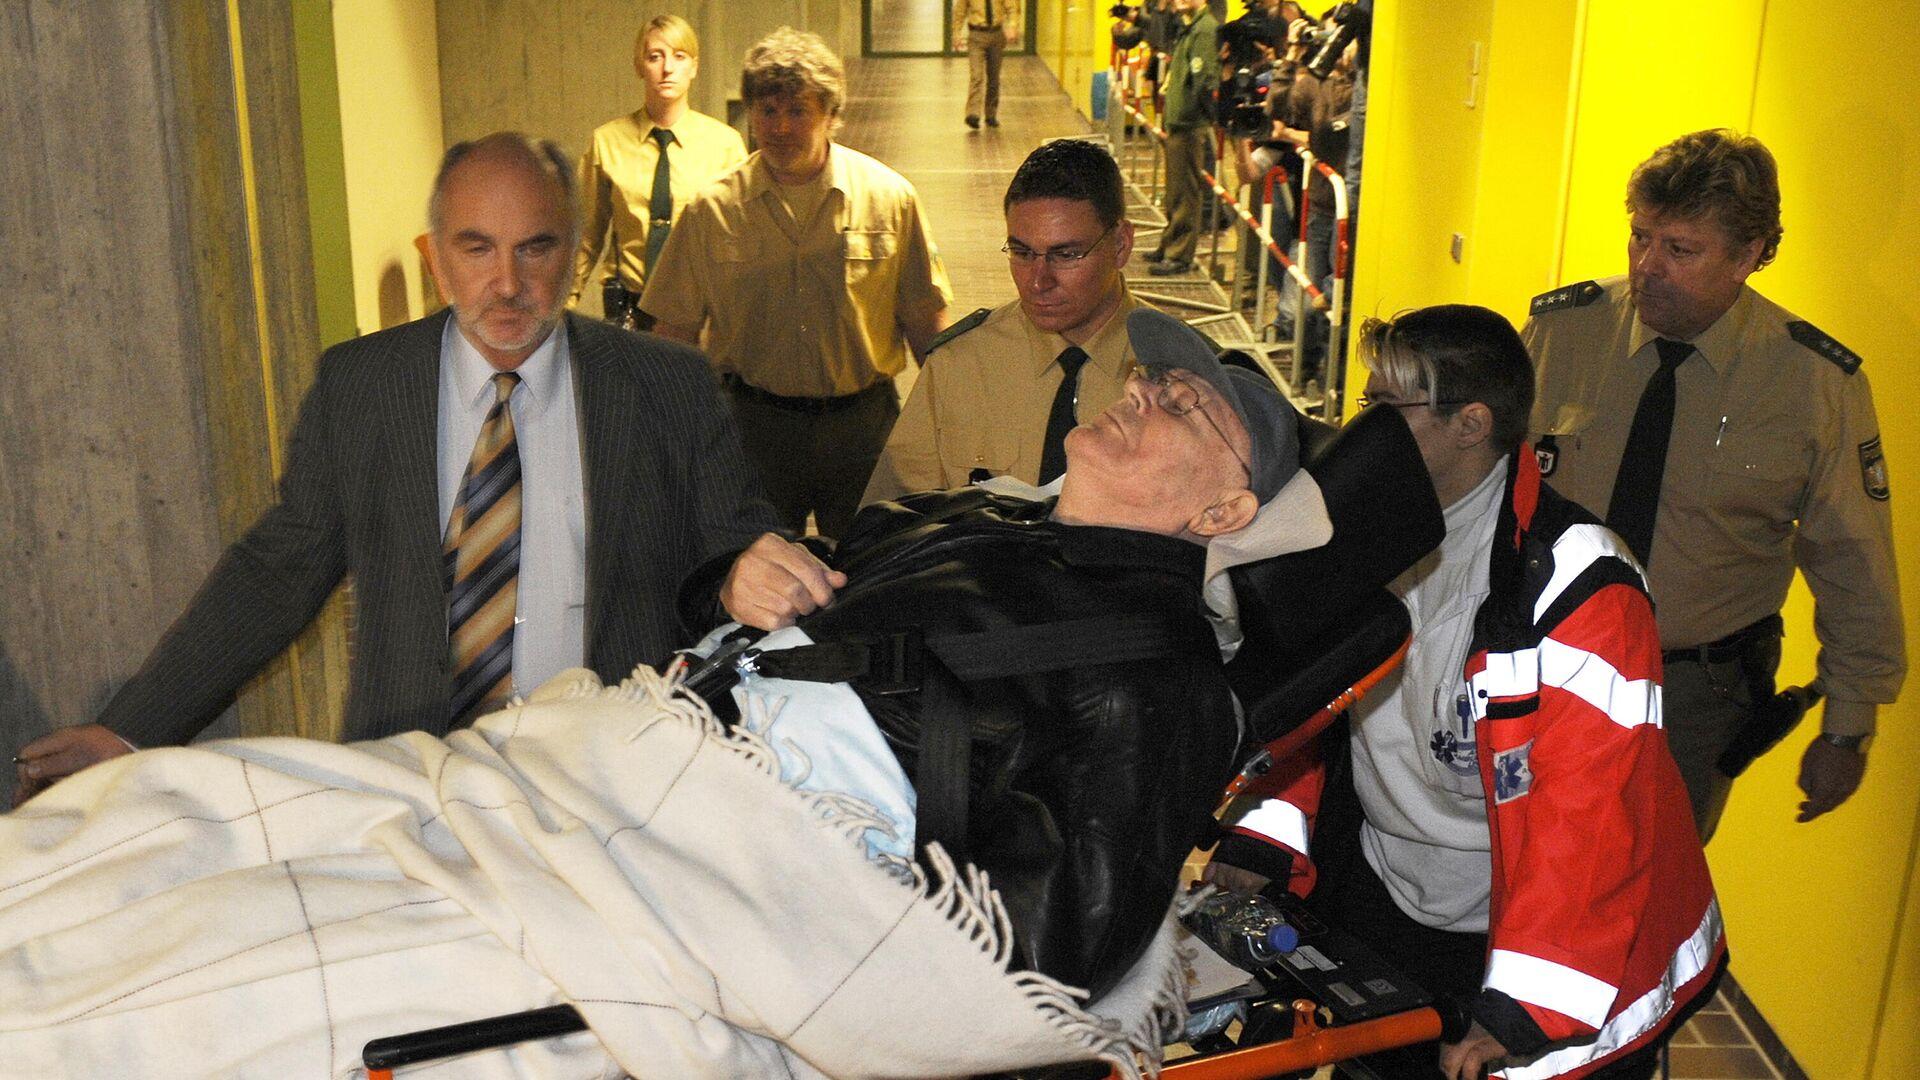 Llegada de John Demjanjuk a la corte de Múnich en 2009 - Sputnik Mundo, 1920, 16.03.2021